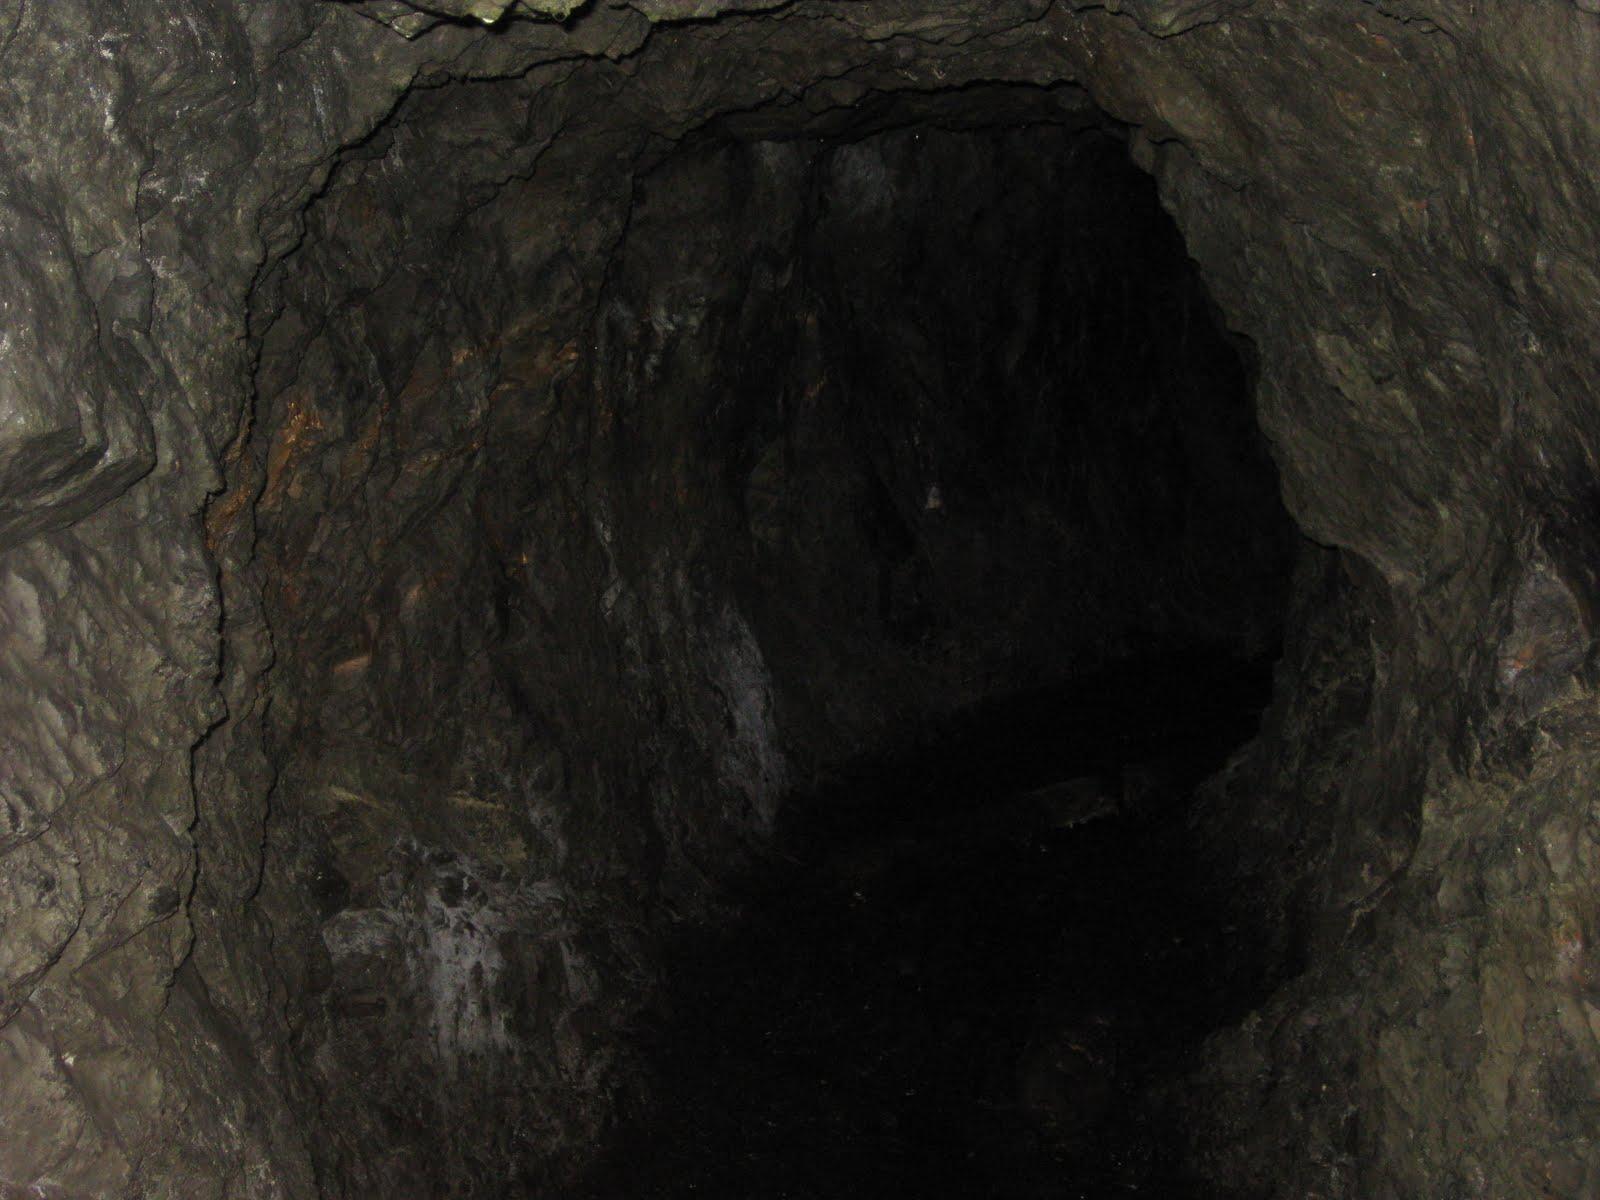 Thehanramans Bat Caves